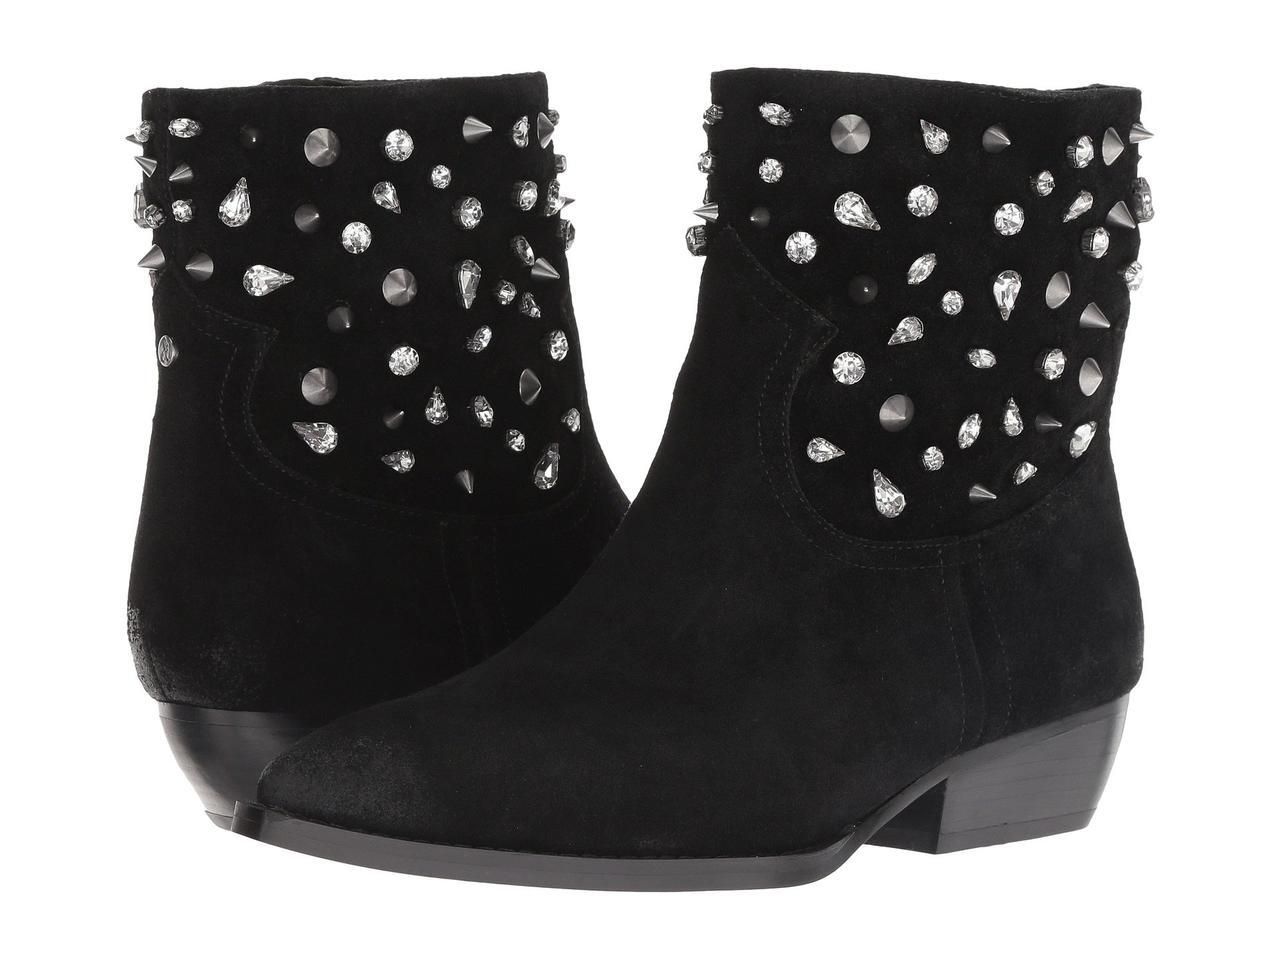 Ботинки Sam Edelman Avril Black Velutto - Оригинал, фото 1